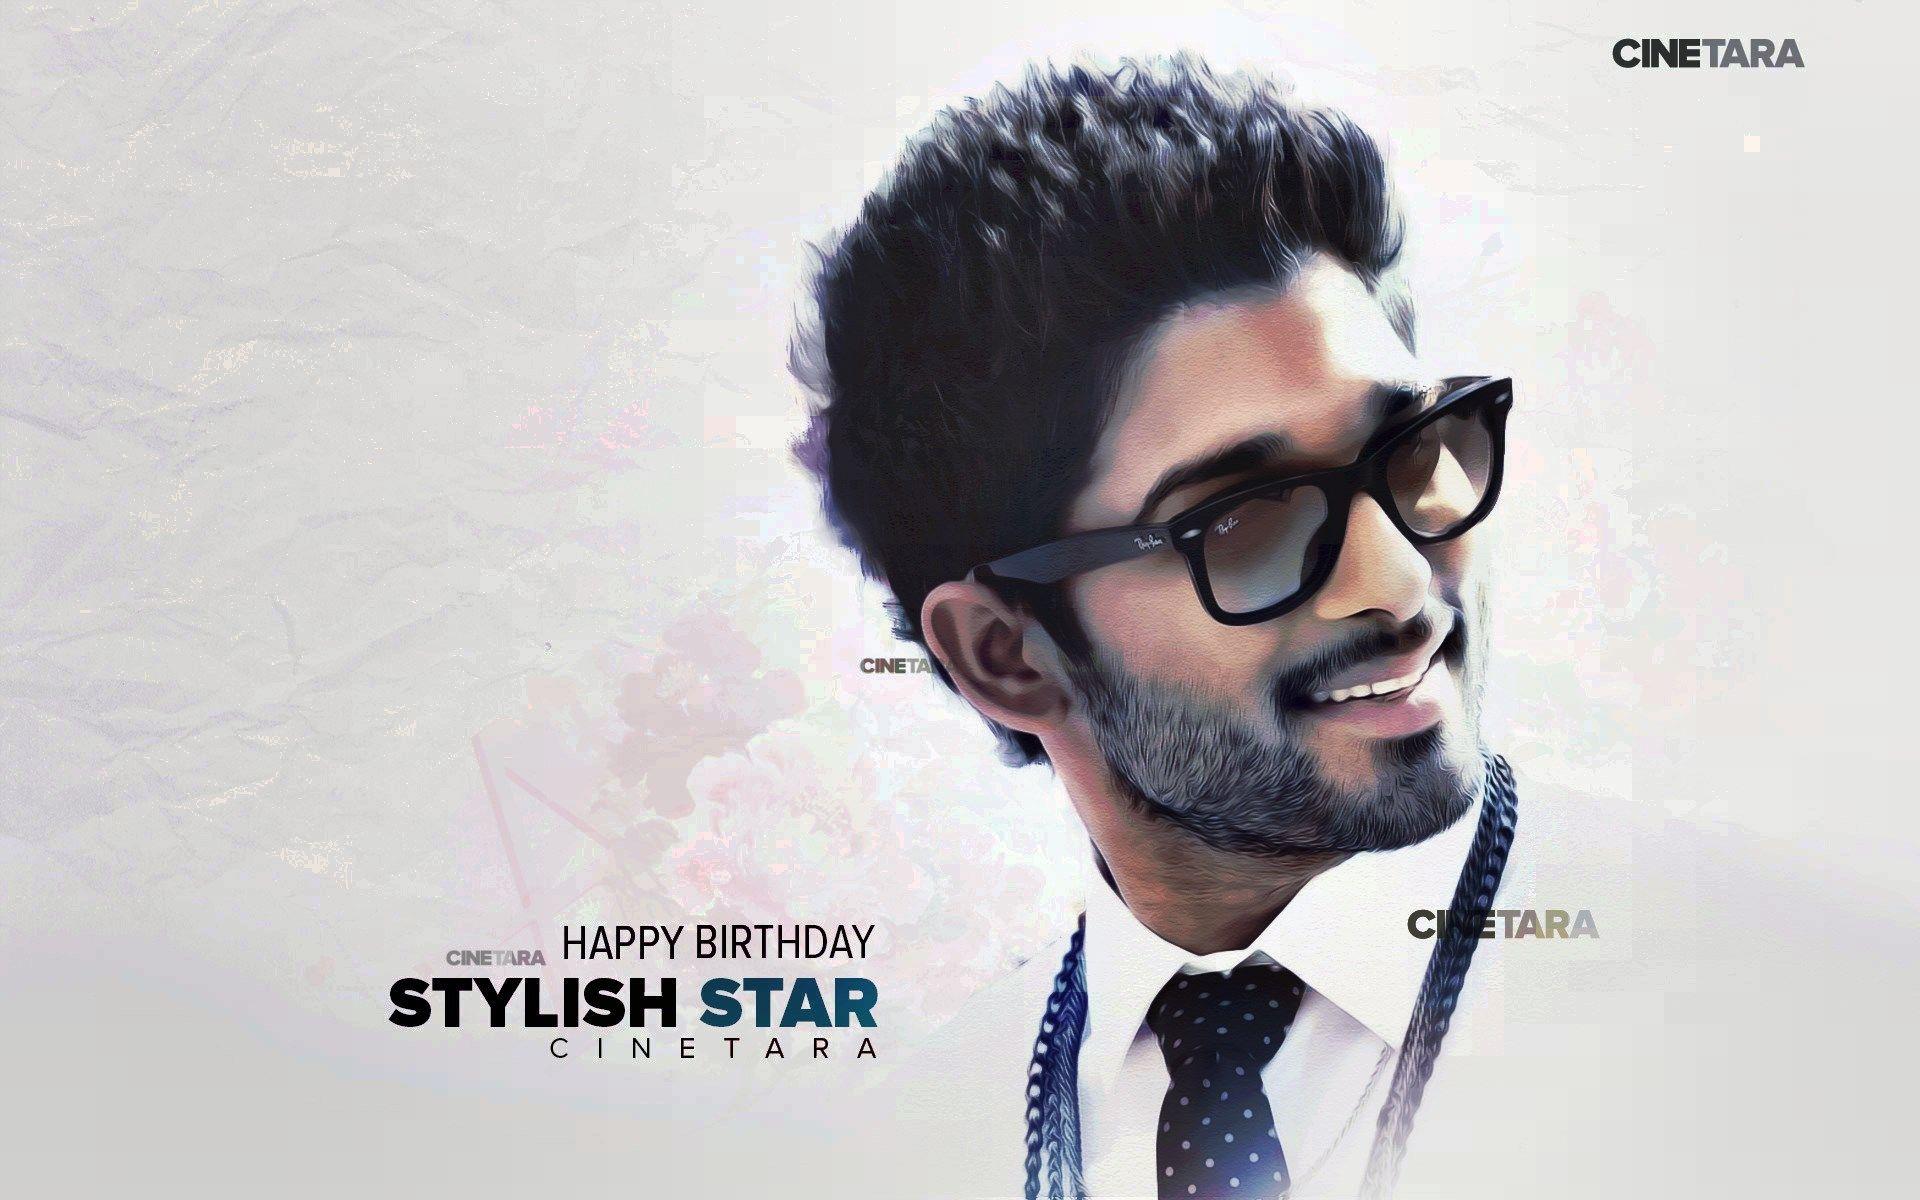 allu arjun happy movie background music free download